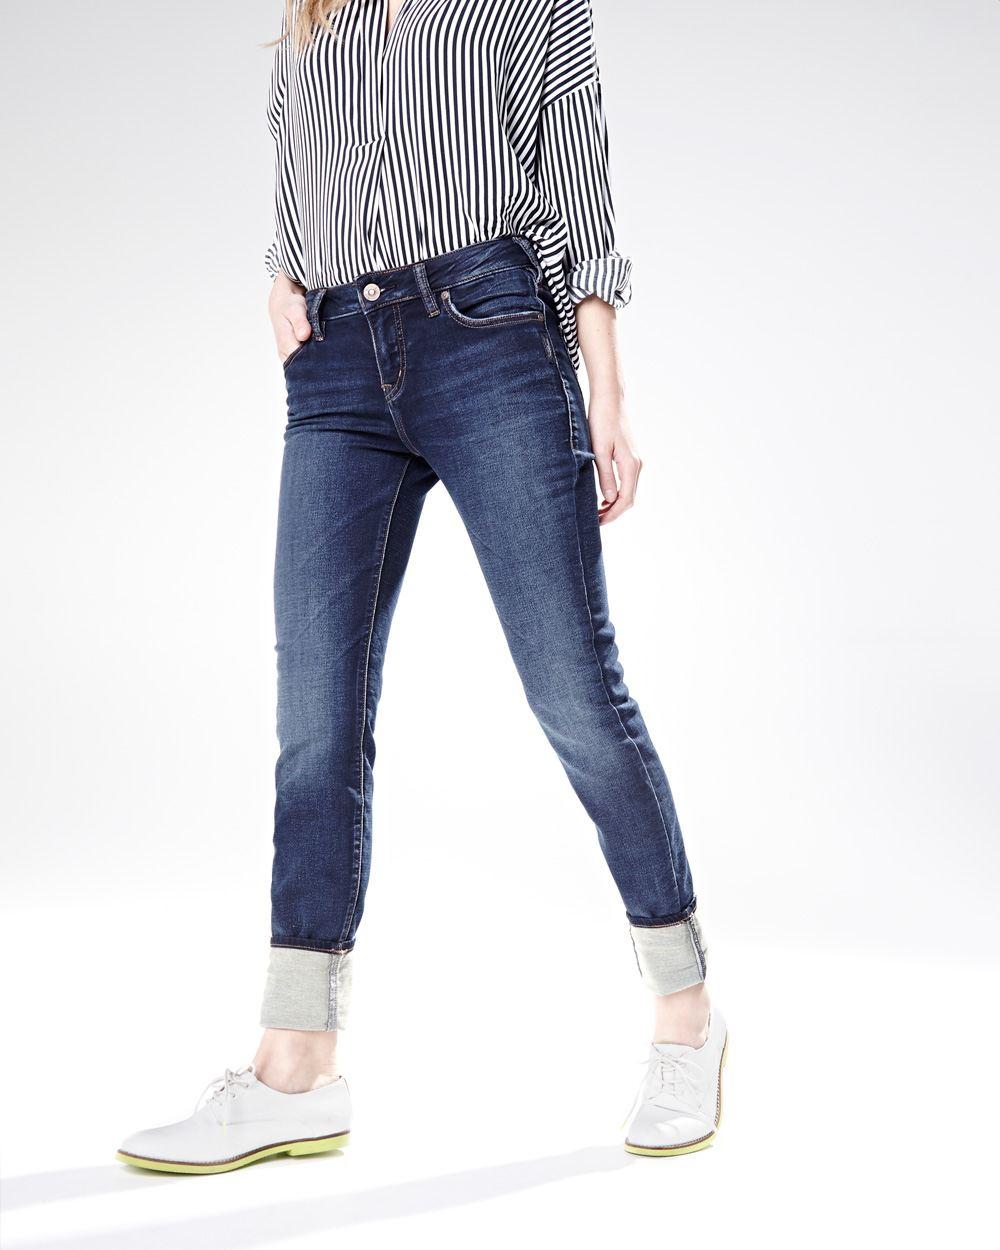 98f1362a Silver jeans (TM) - Aiko high waist knit skinny jeans in dark blue ...